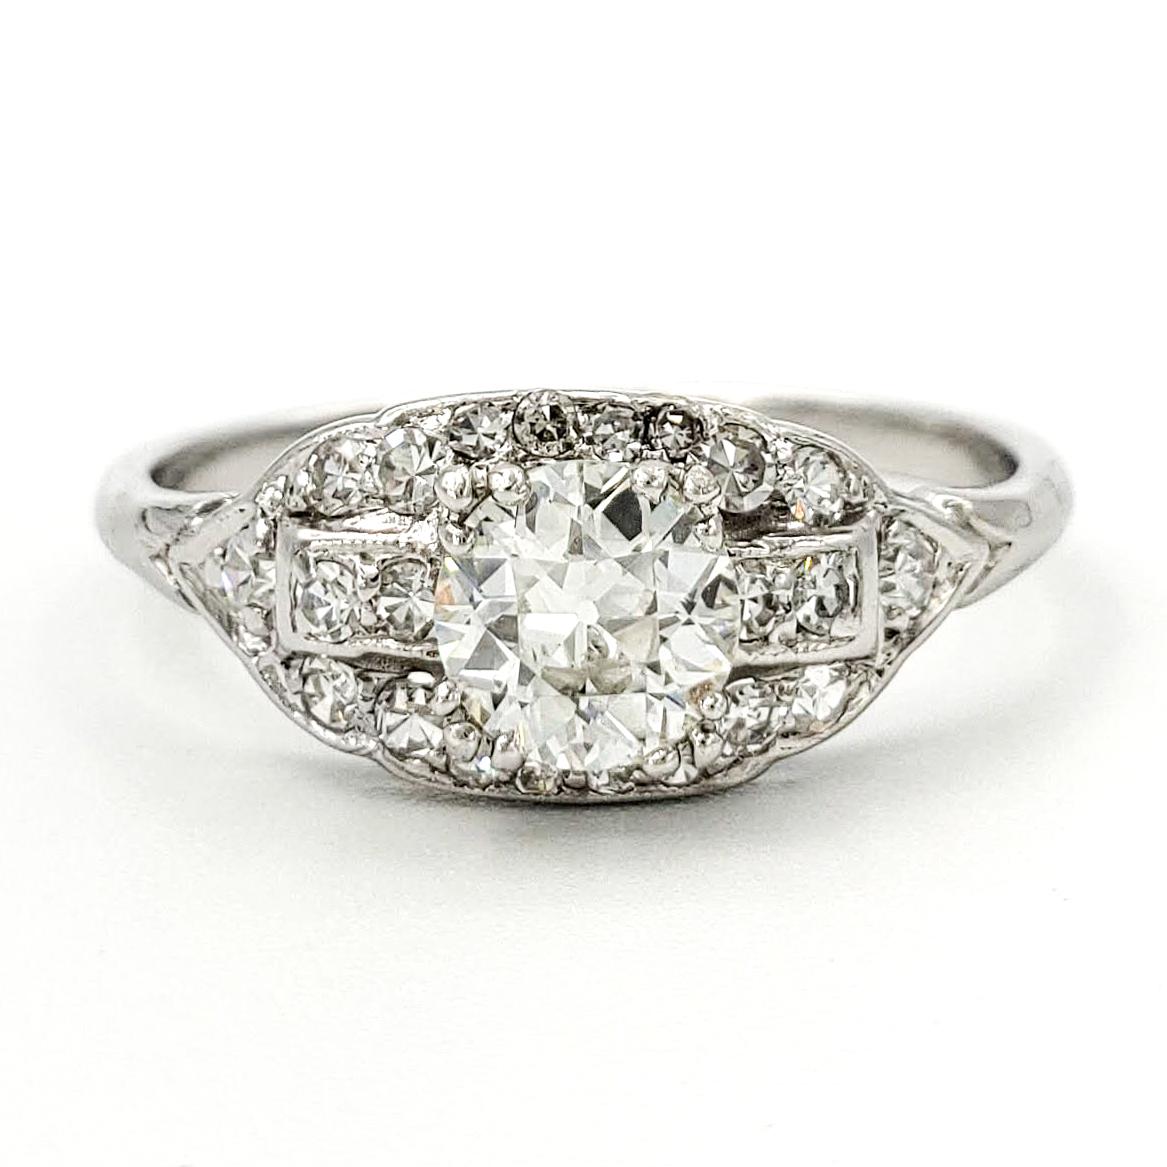 vintage-platinum-engagement-ring-with-0-59-carat-old-european-cut-diamond-egl-h-vs2-2